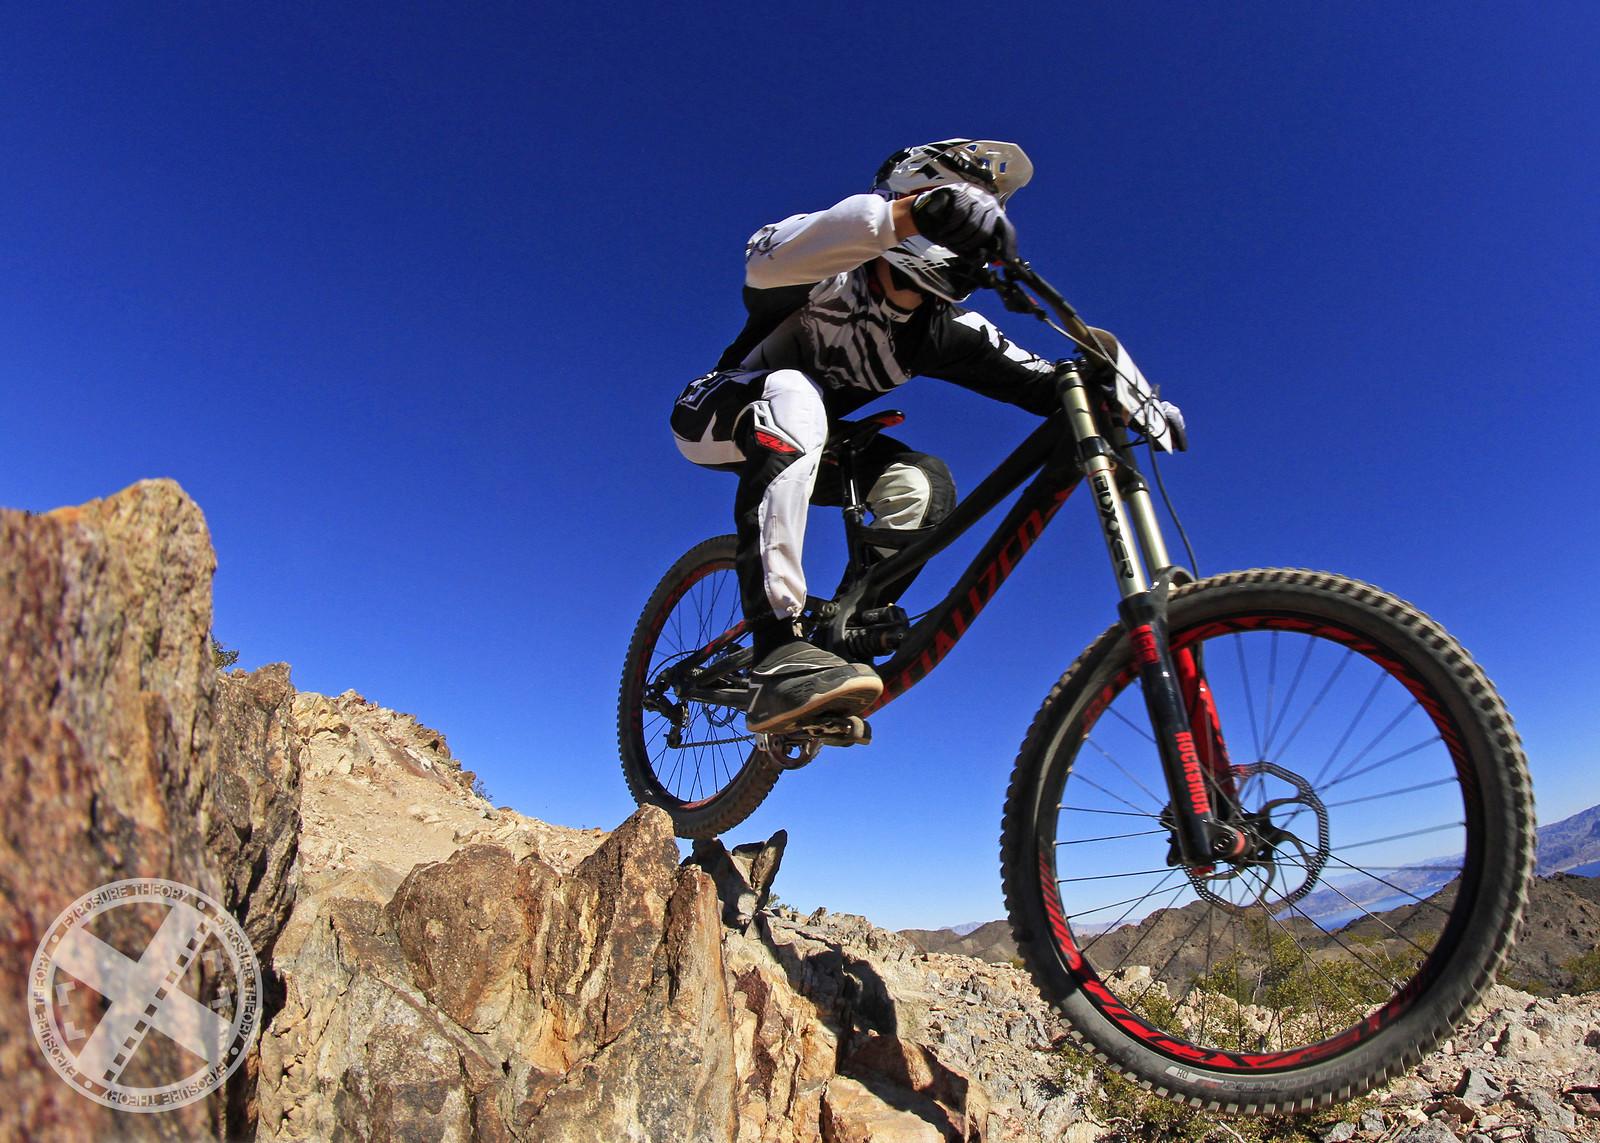 Bootleg 3 t2013 Nevada State DH Race @ Bootleg Canyon. - projekt roam - Mountain Biking Pictures - Vital MTB